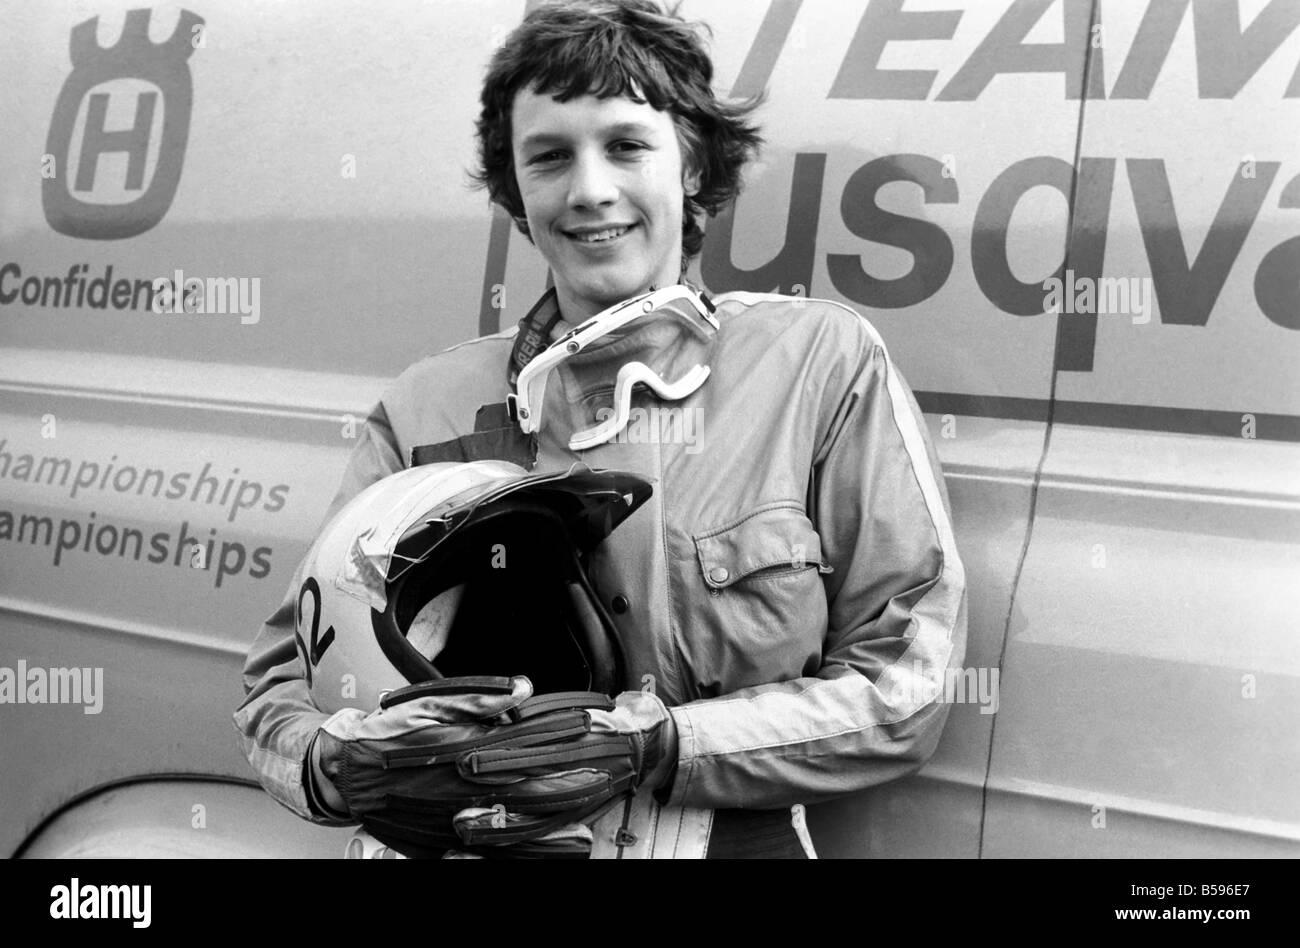 Motorsport/Children/Motorbike: Schoolboys Scramble. March 1975 75-01212 - Stock Image